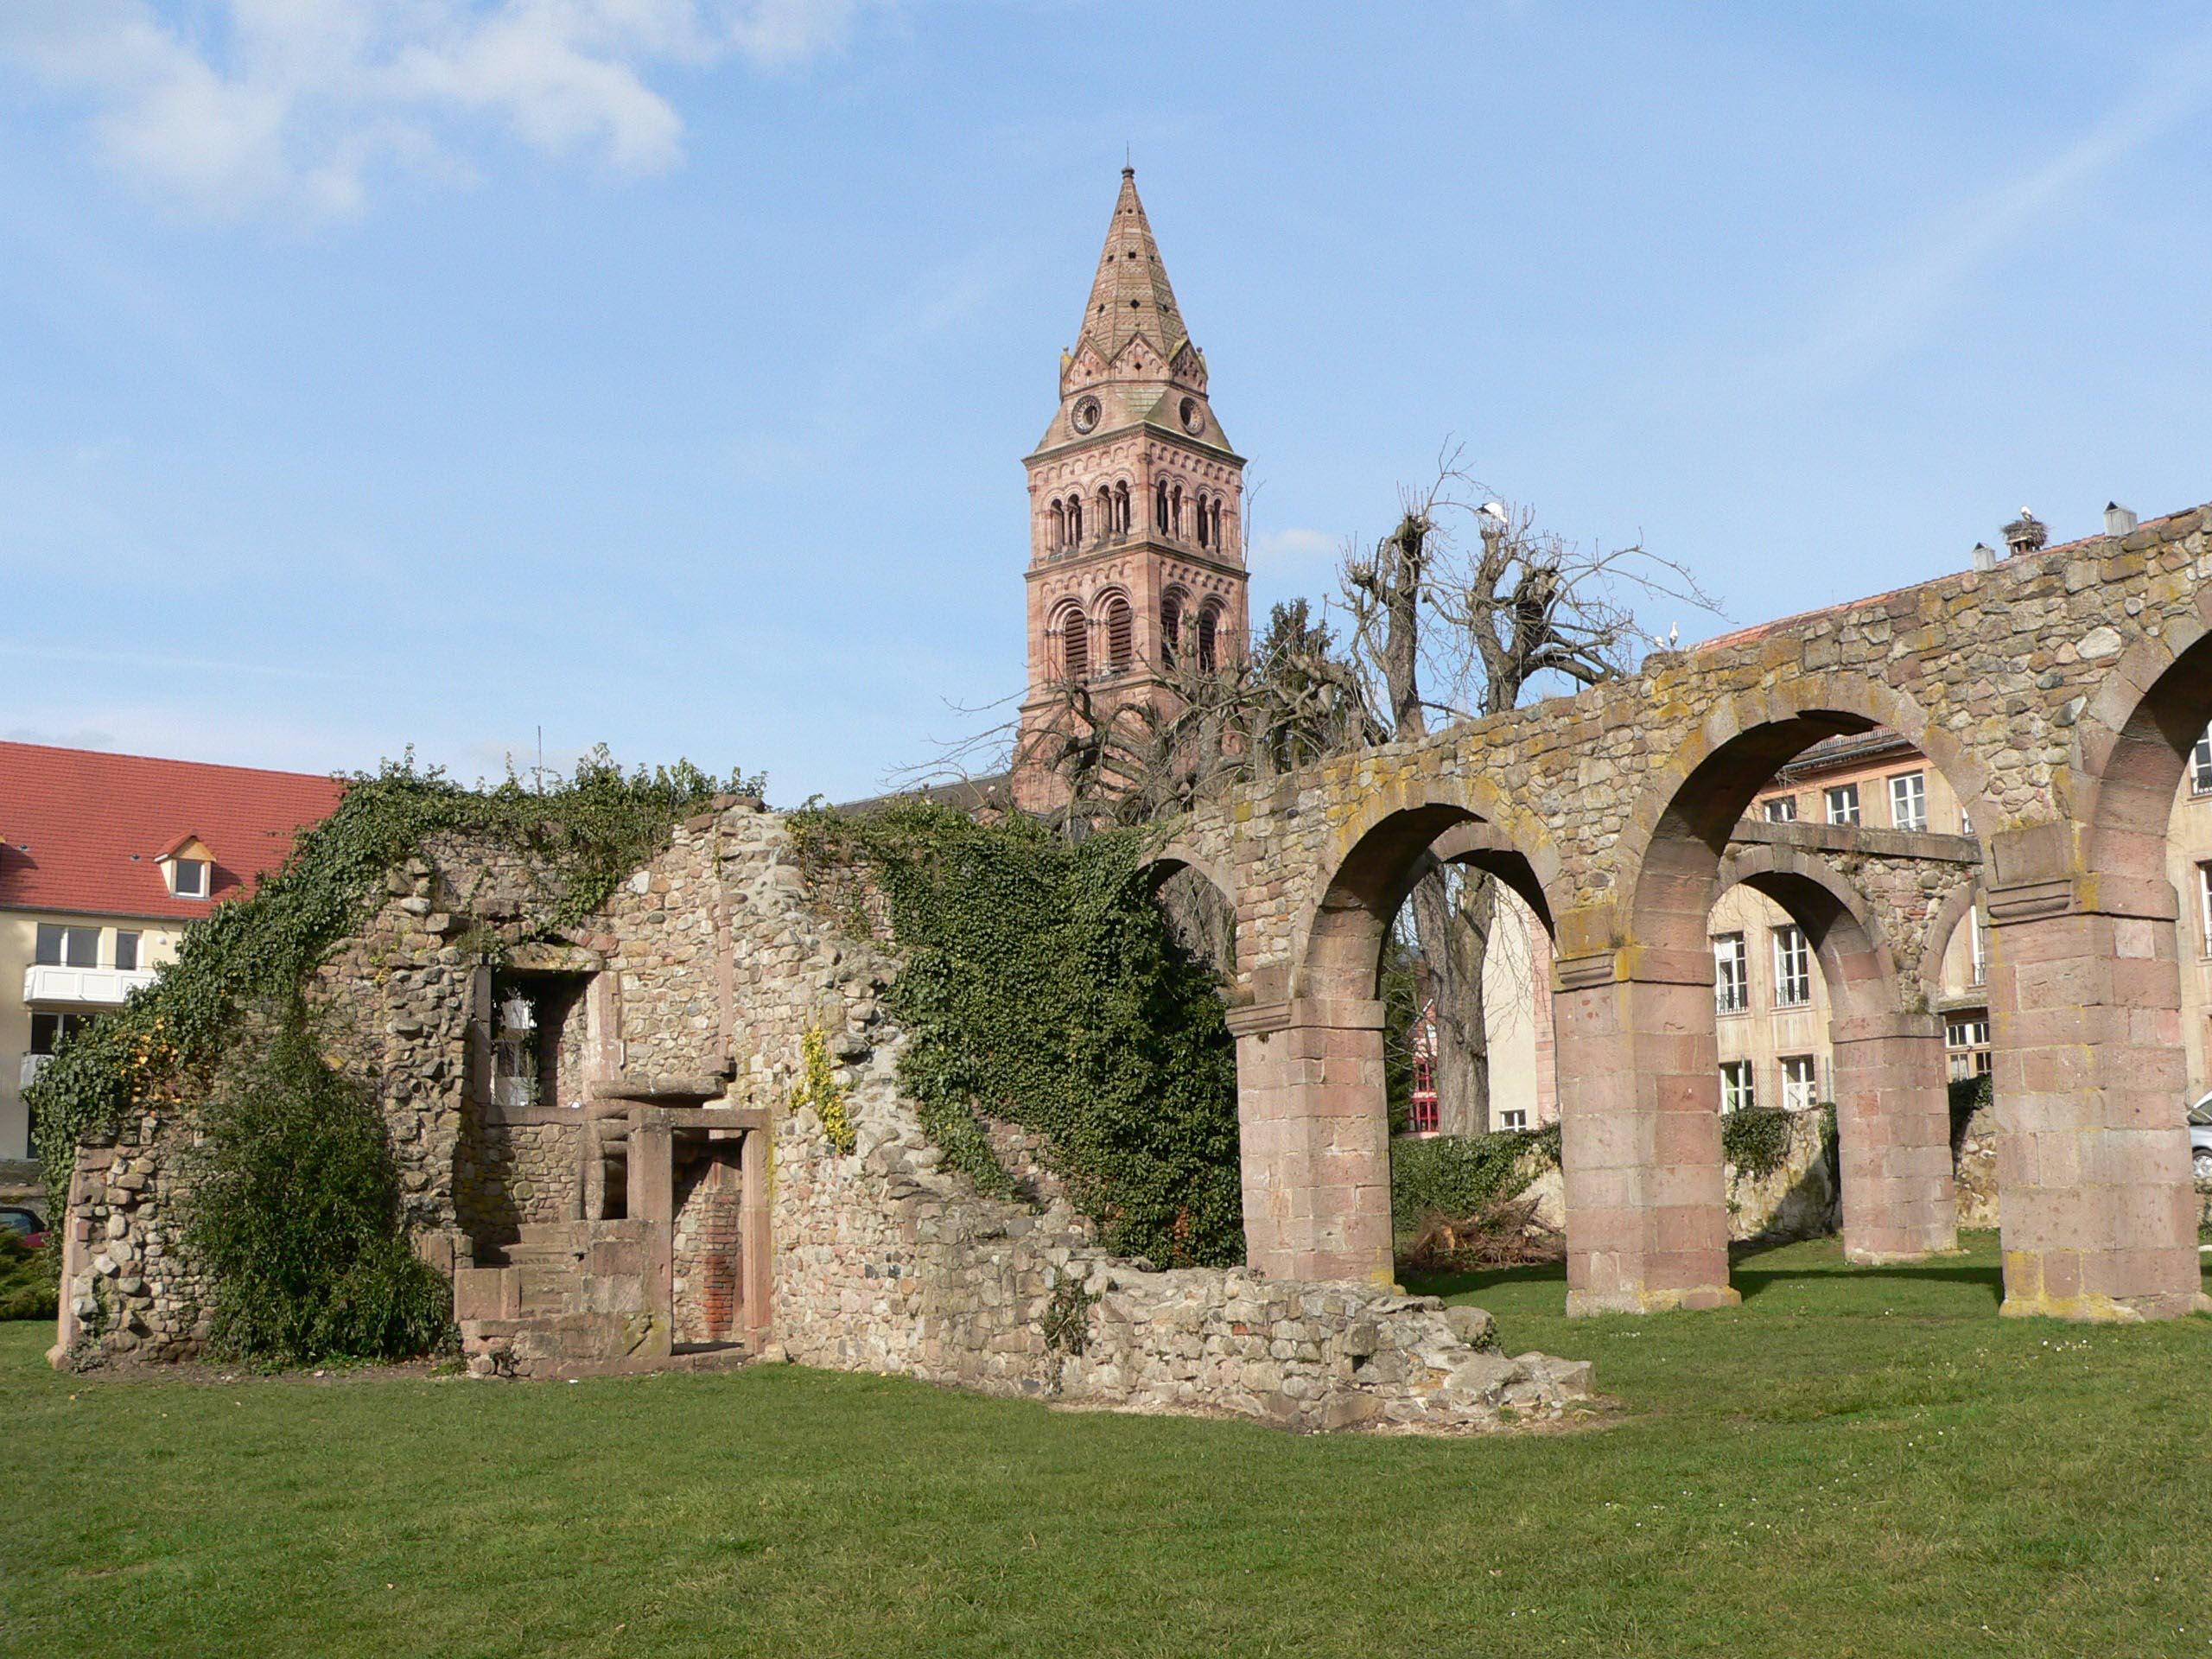 https://upload.wikimedia.org/wikipedia/commons/a/ab/Ruines_1.jpg?uselang=fr